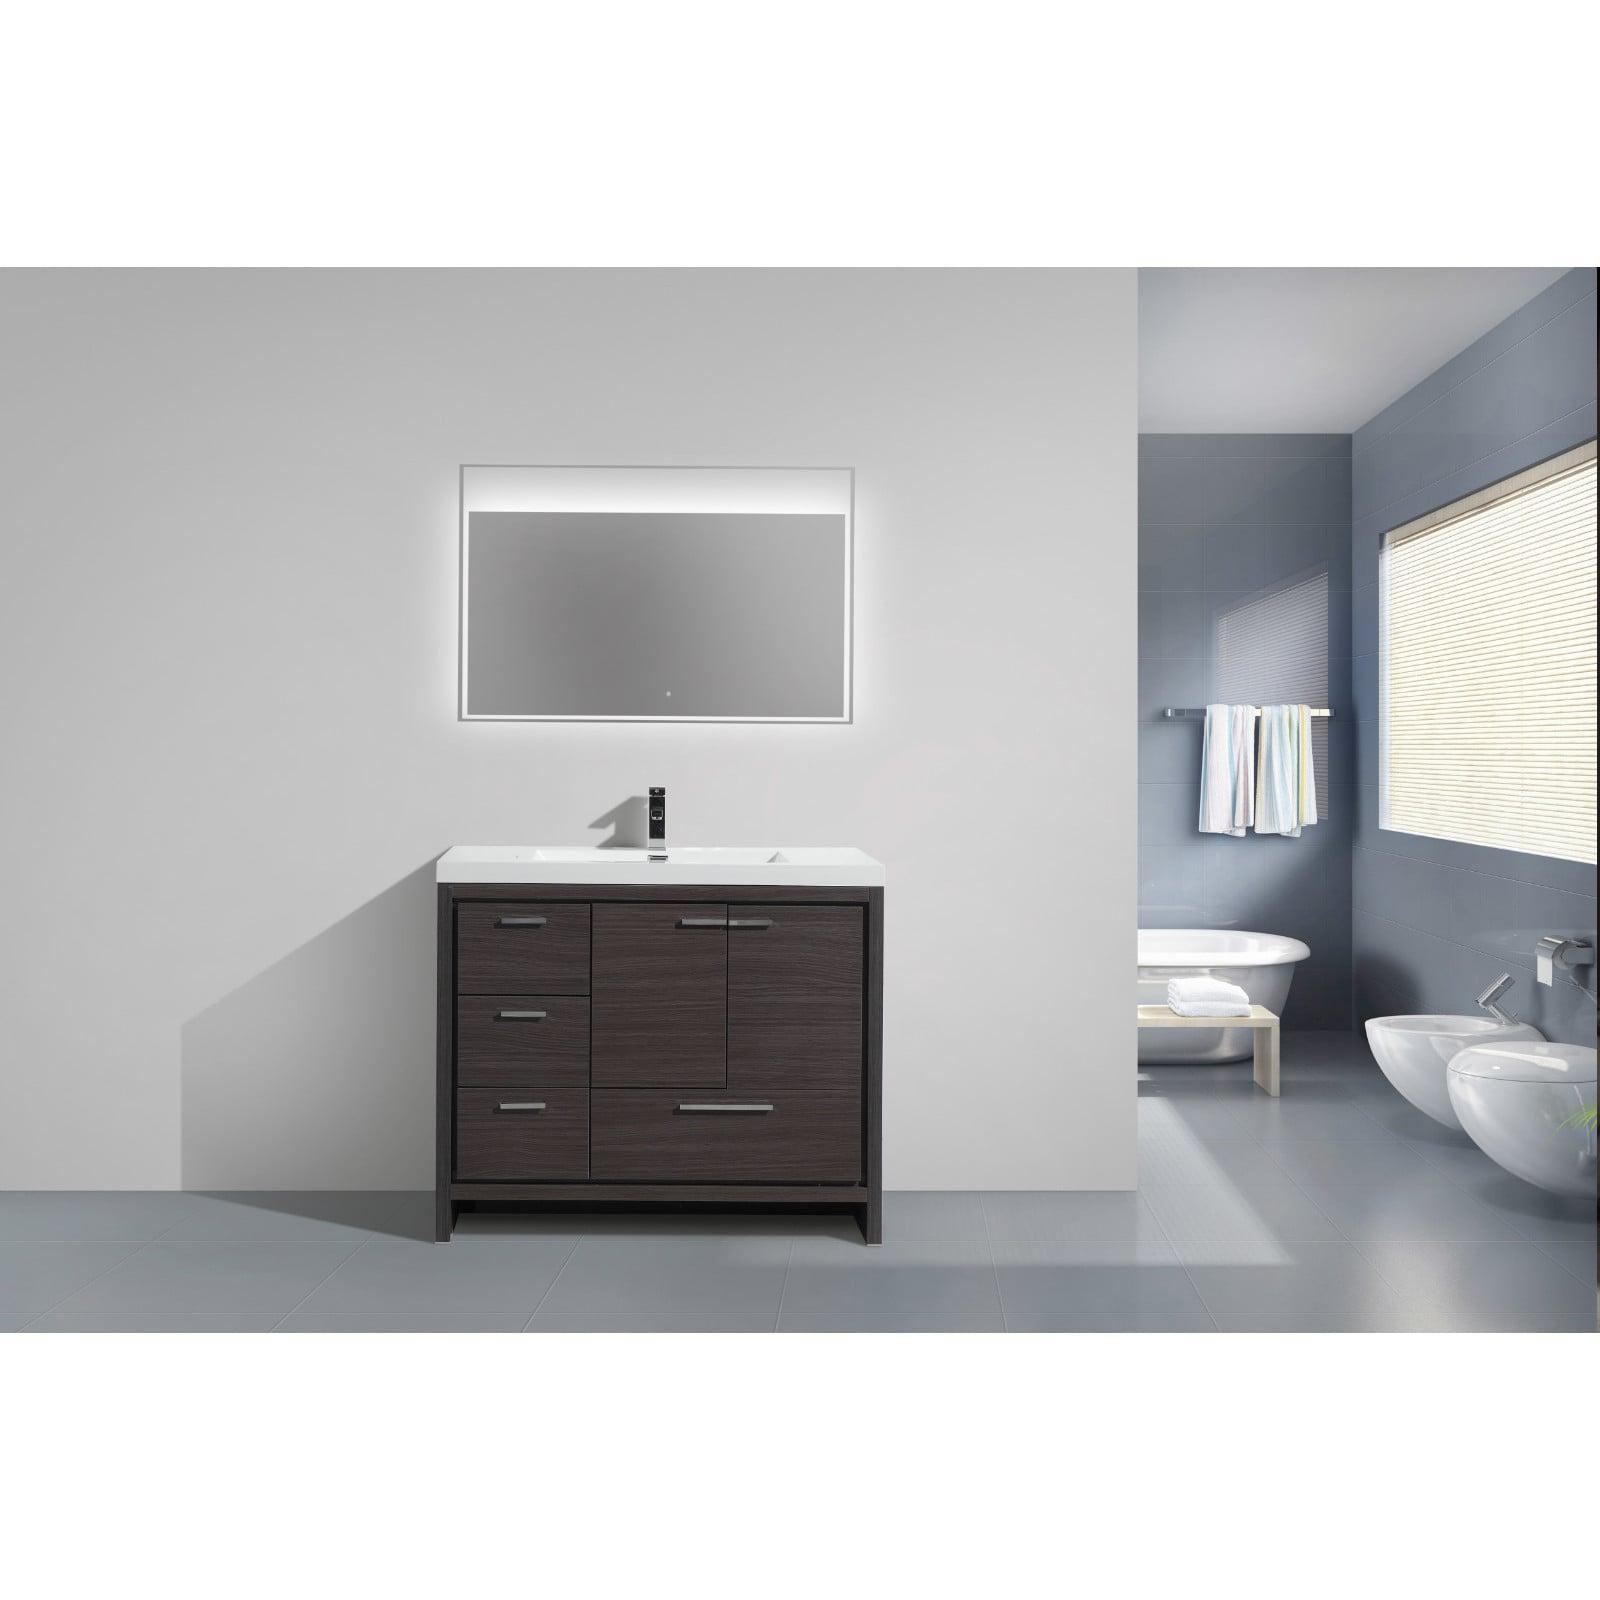 Moreno Bath Mod 42 Inch Free Standing Modern Bathroom Vanity With